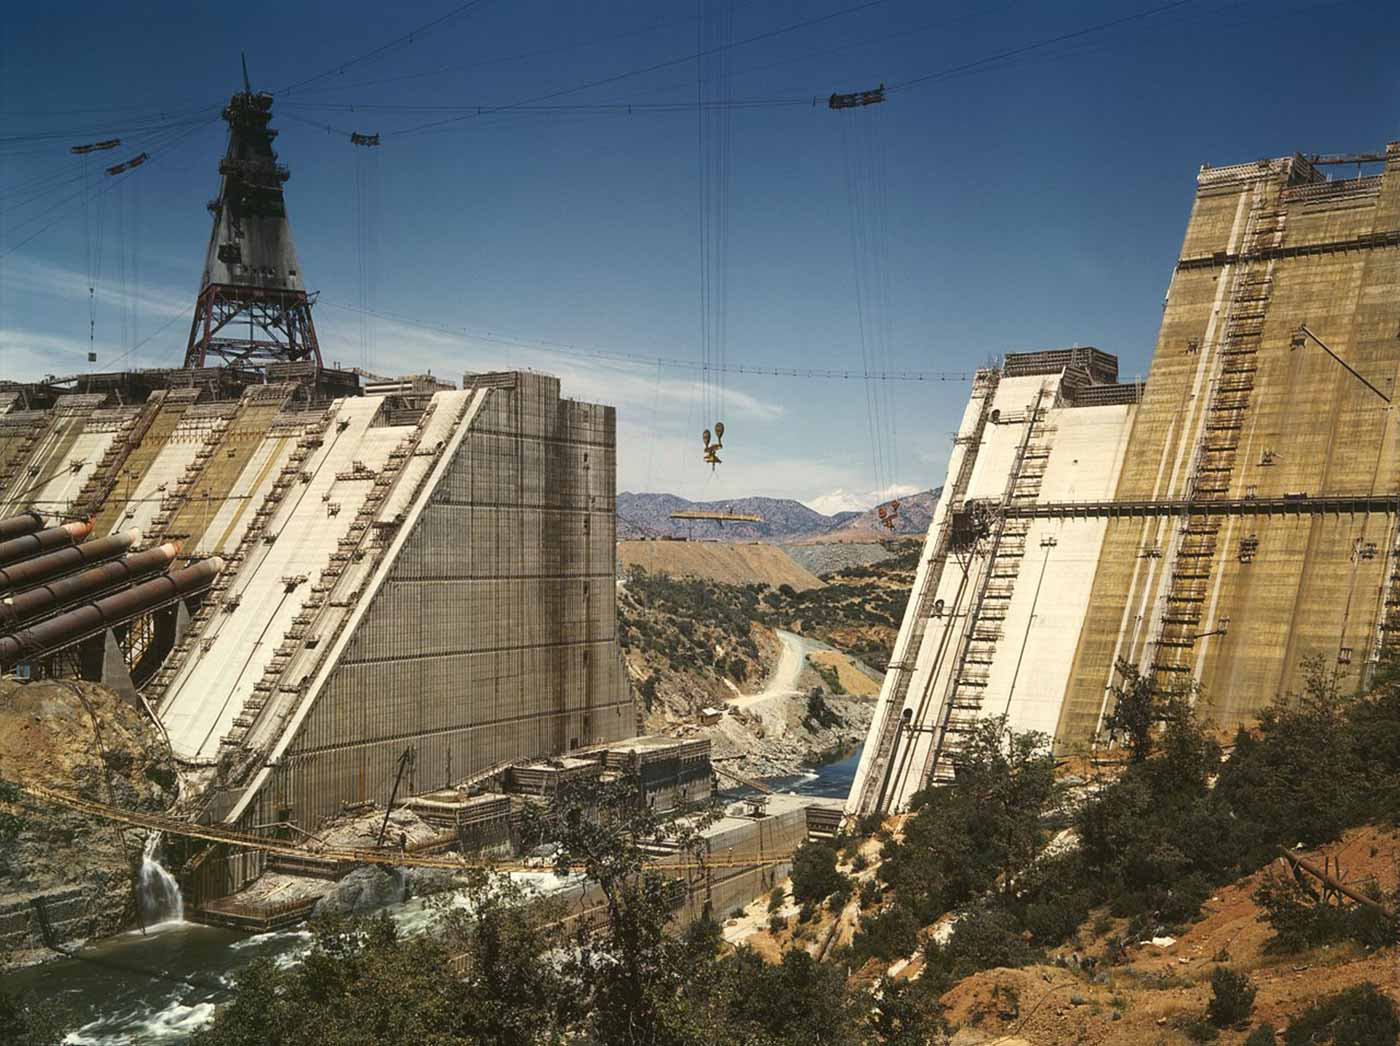 Shasta dam under construction